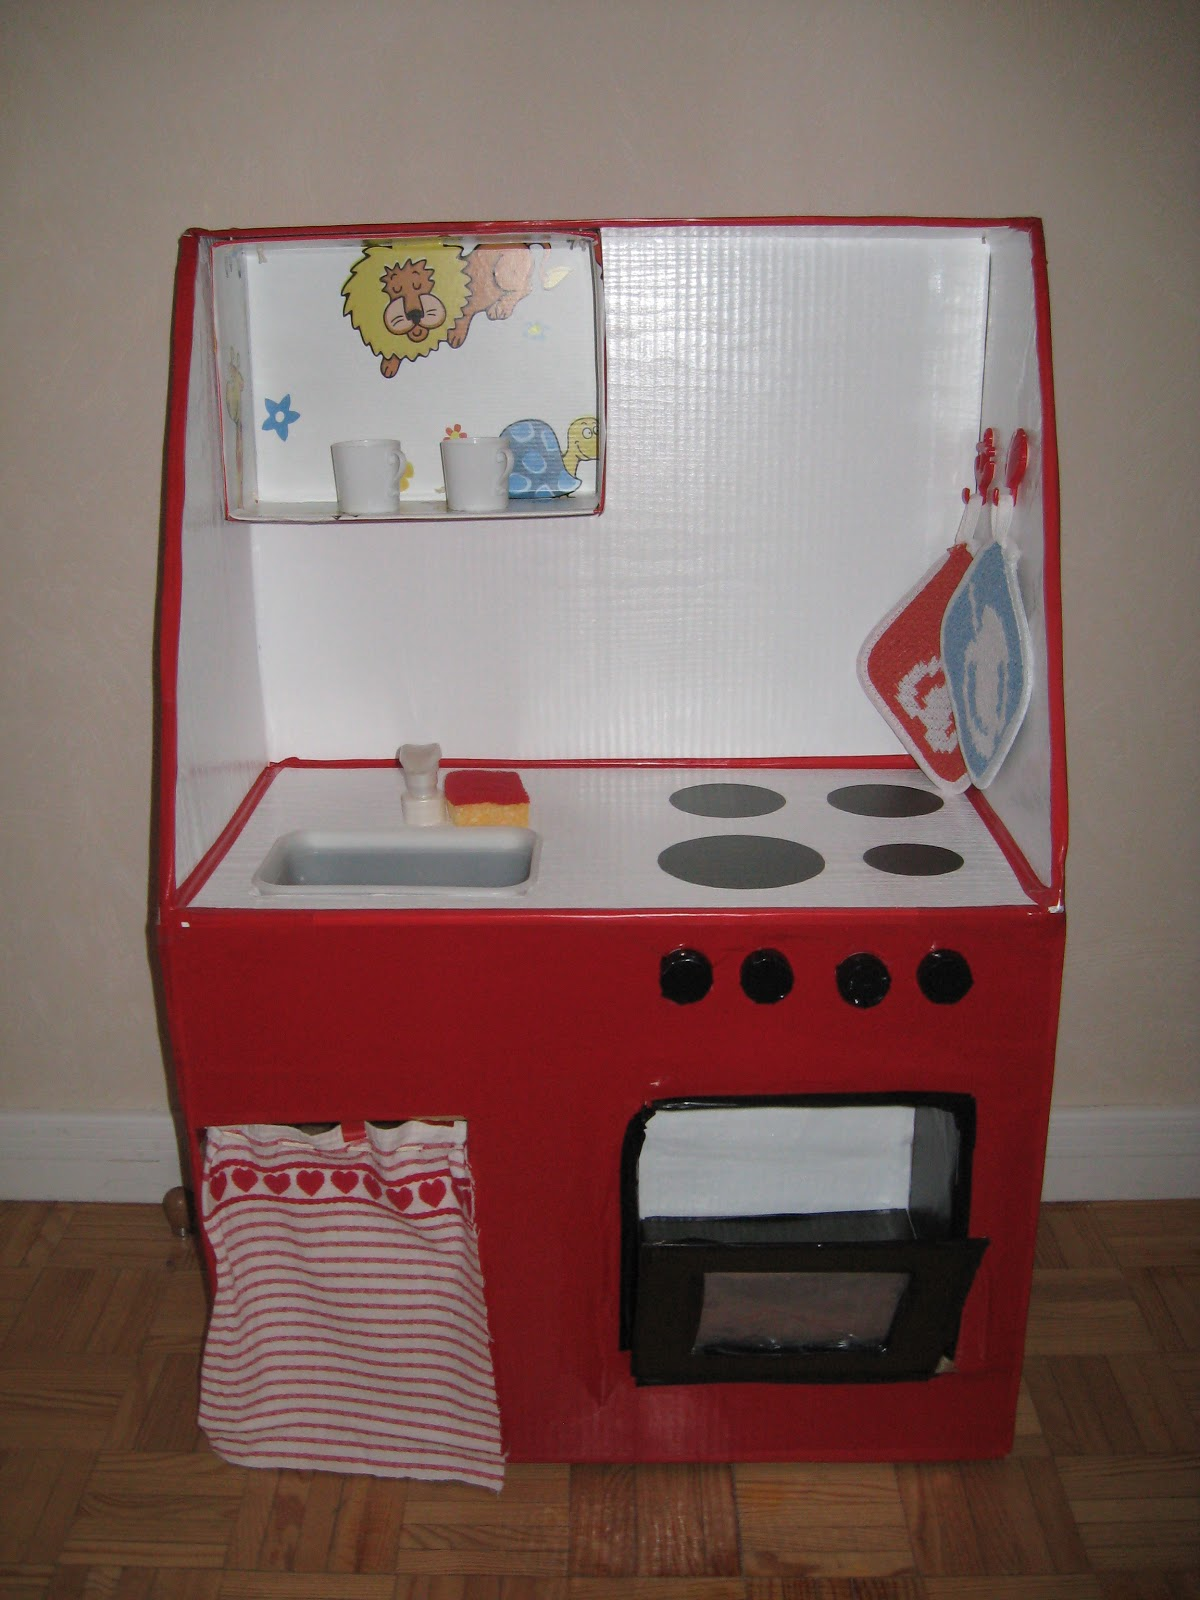 Mammarum giochi fai da te come costruire una cucina per - Cucine bambini ikea ...